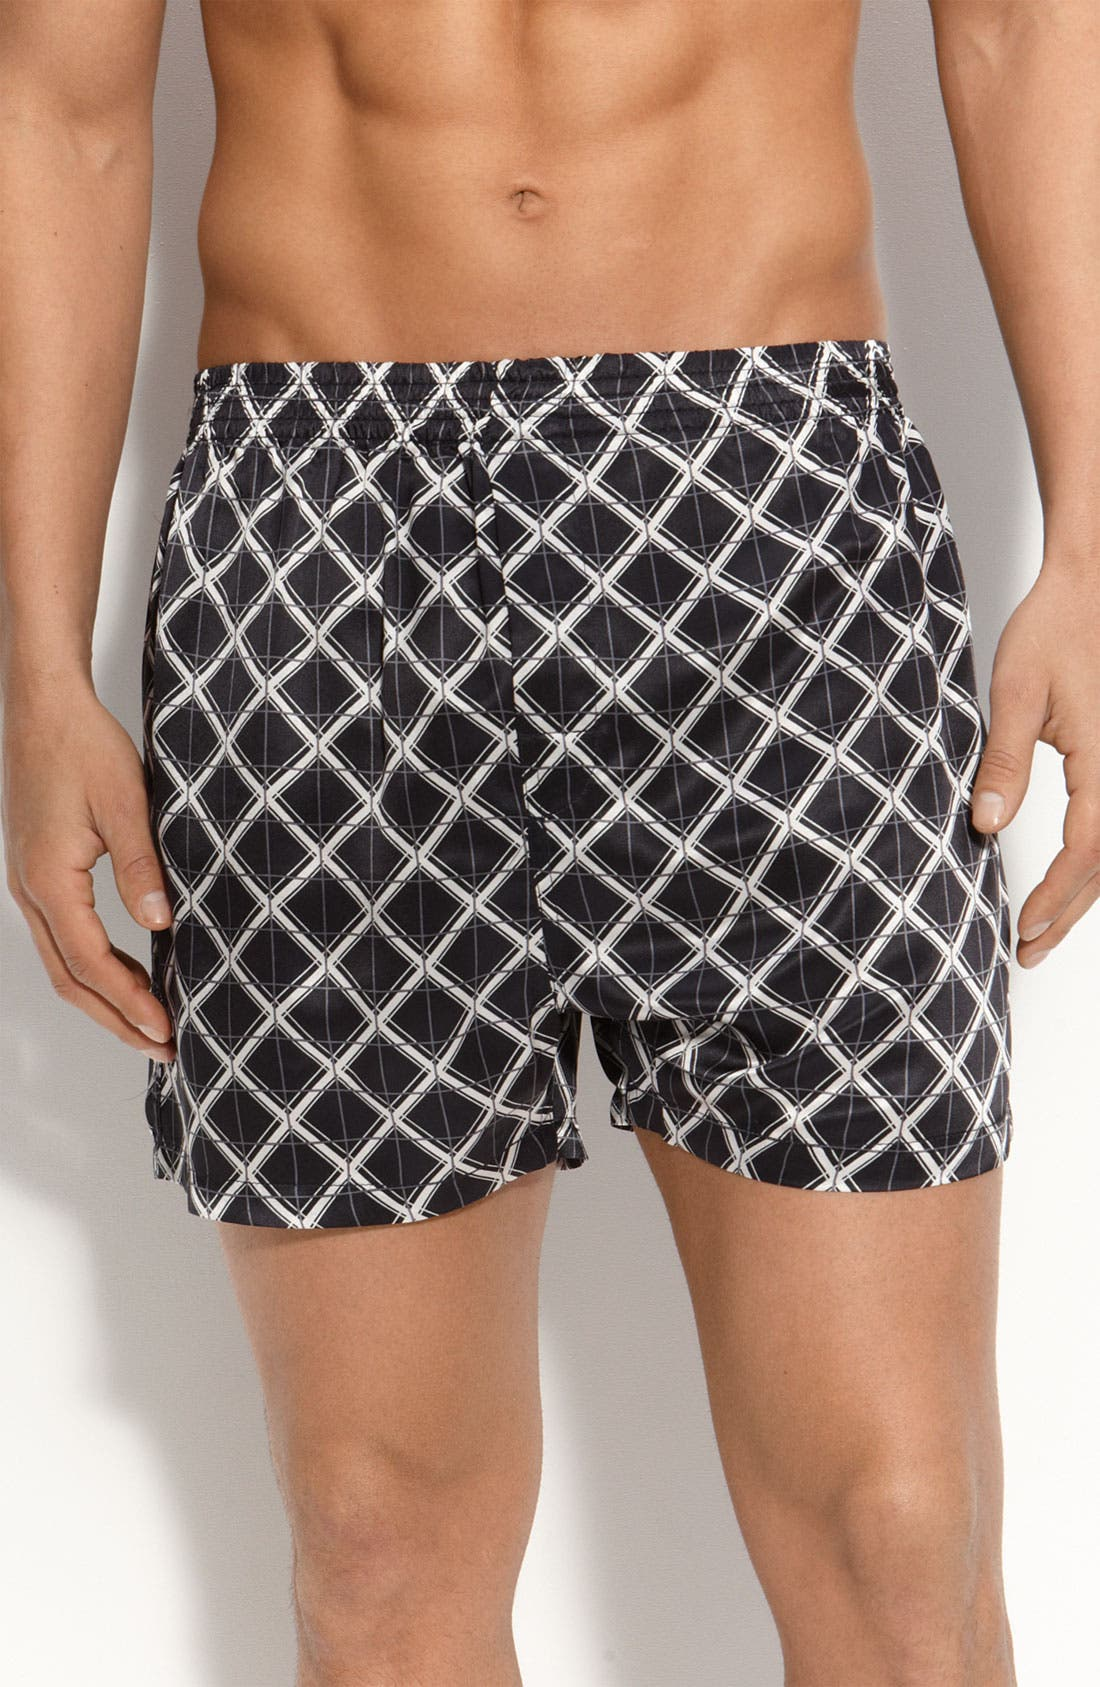 Alternate Image 1 Selected - Majestic International 'Ethans' Silk Boxer Shorts